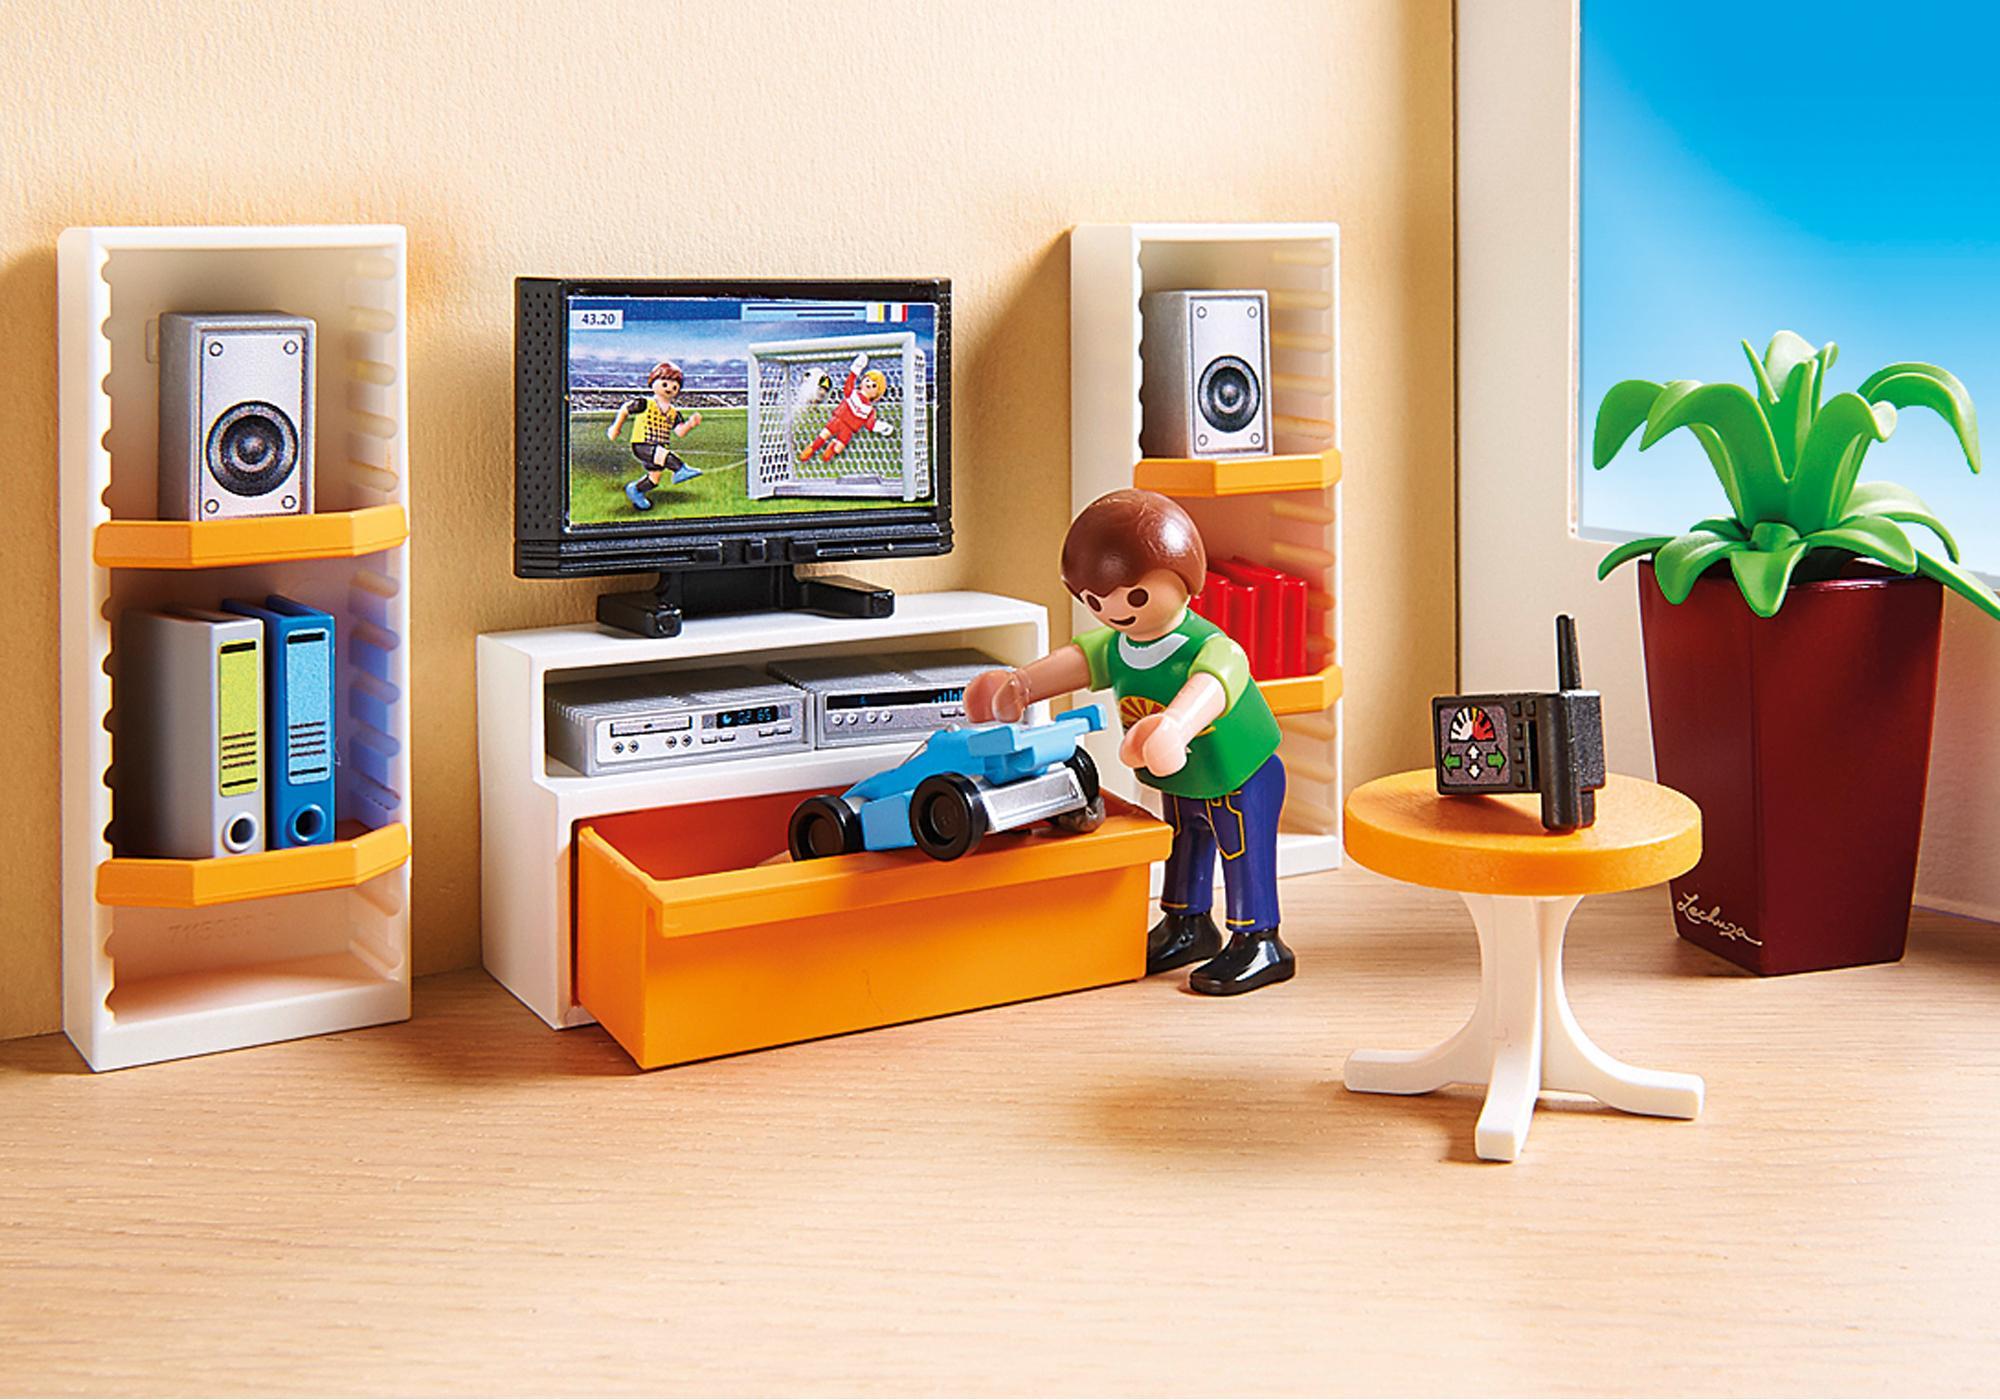 http://media.playmobil.com/i/playmobil/9267_product_extra2/Soggiorno con mobile TV